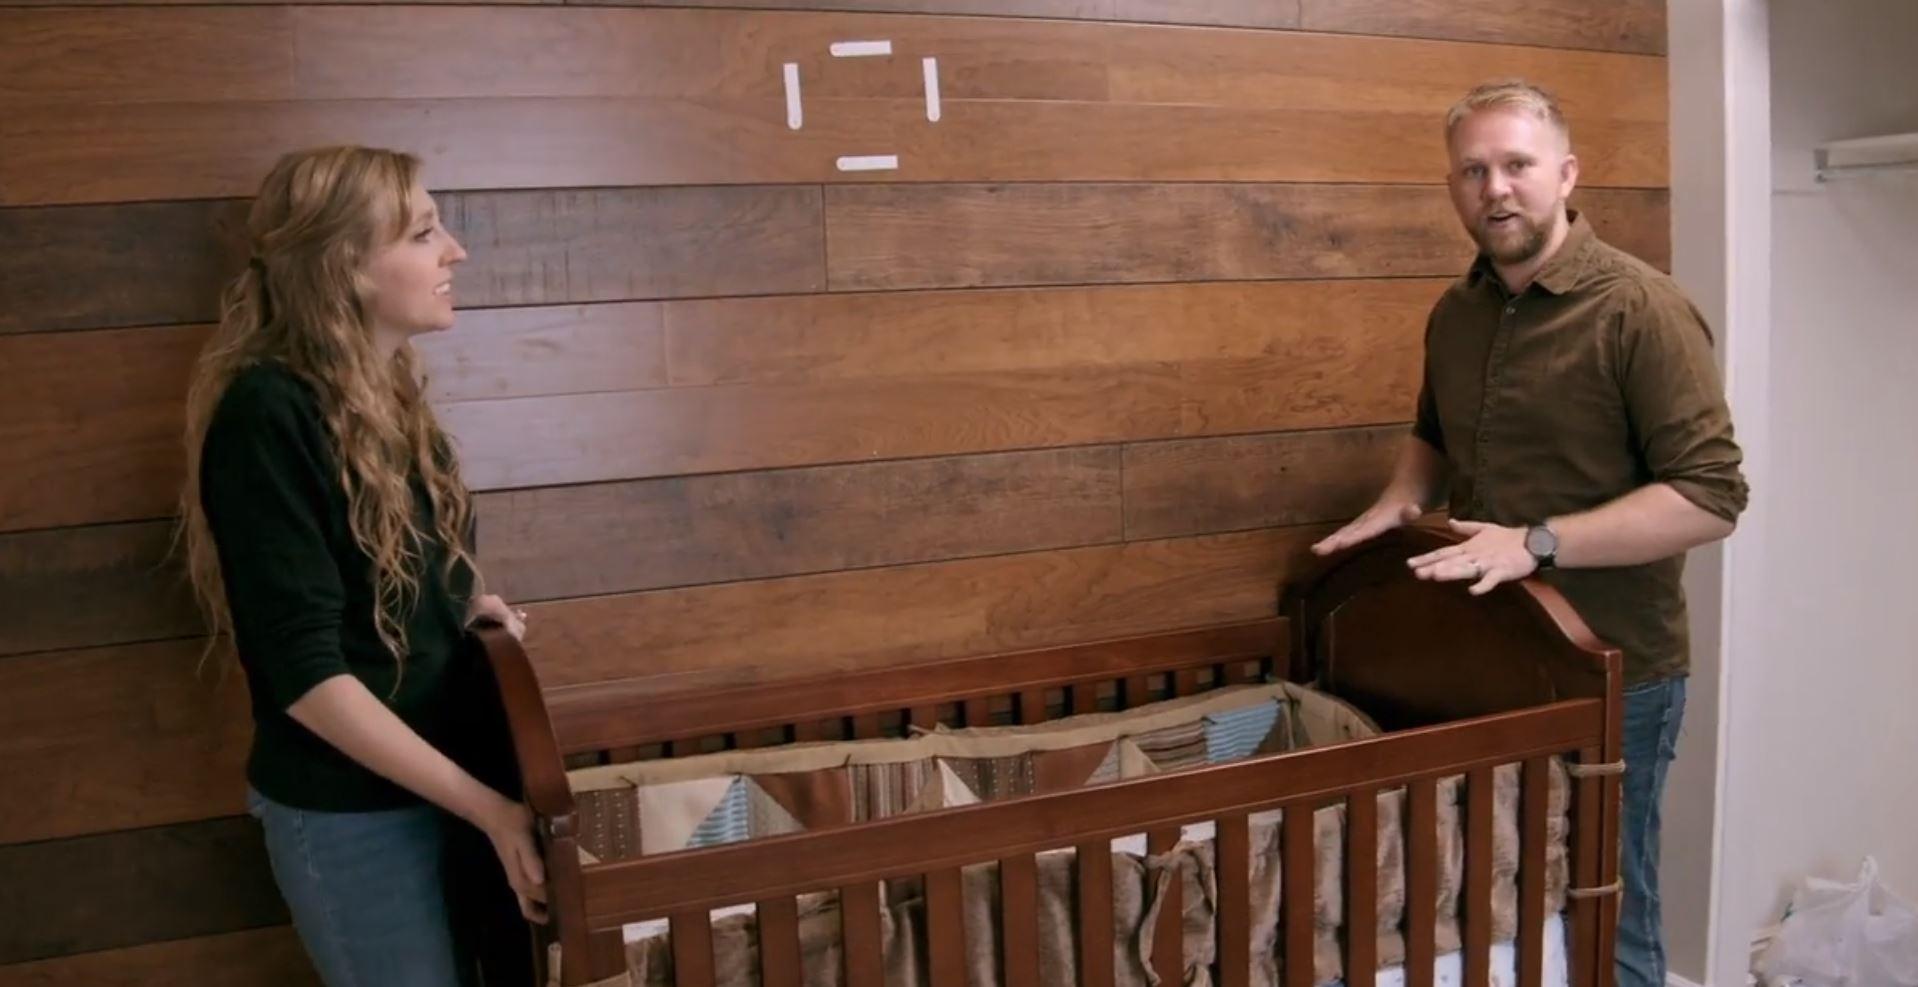 Celeste and Brixton move a crib.